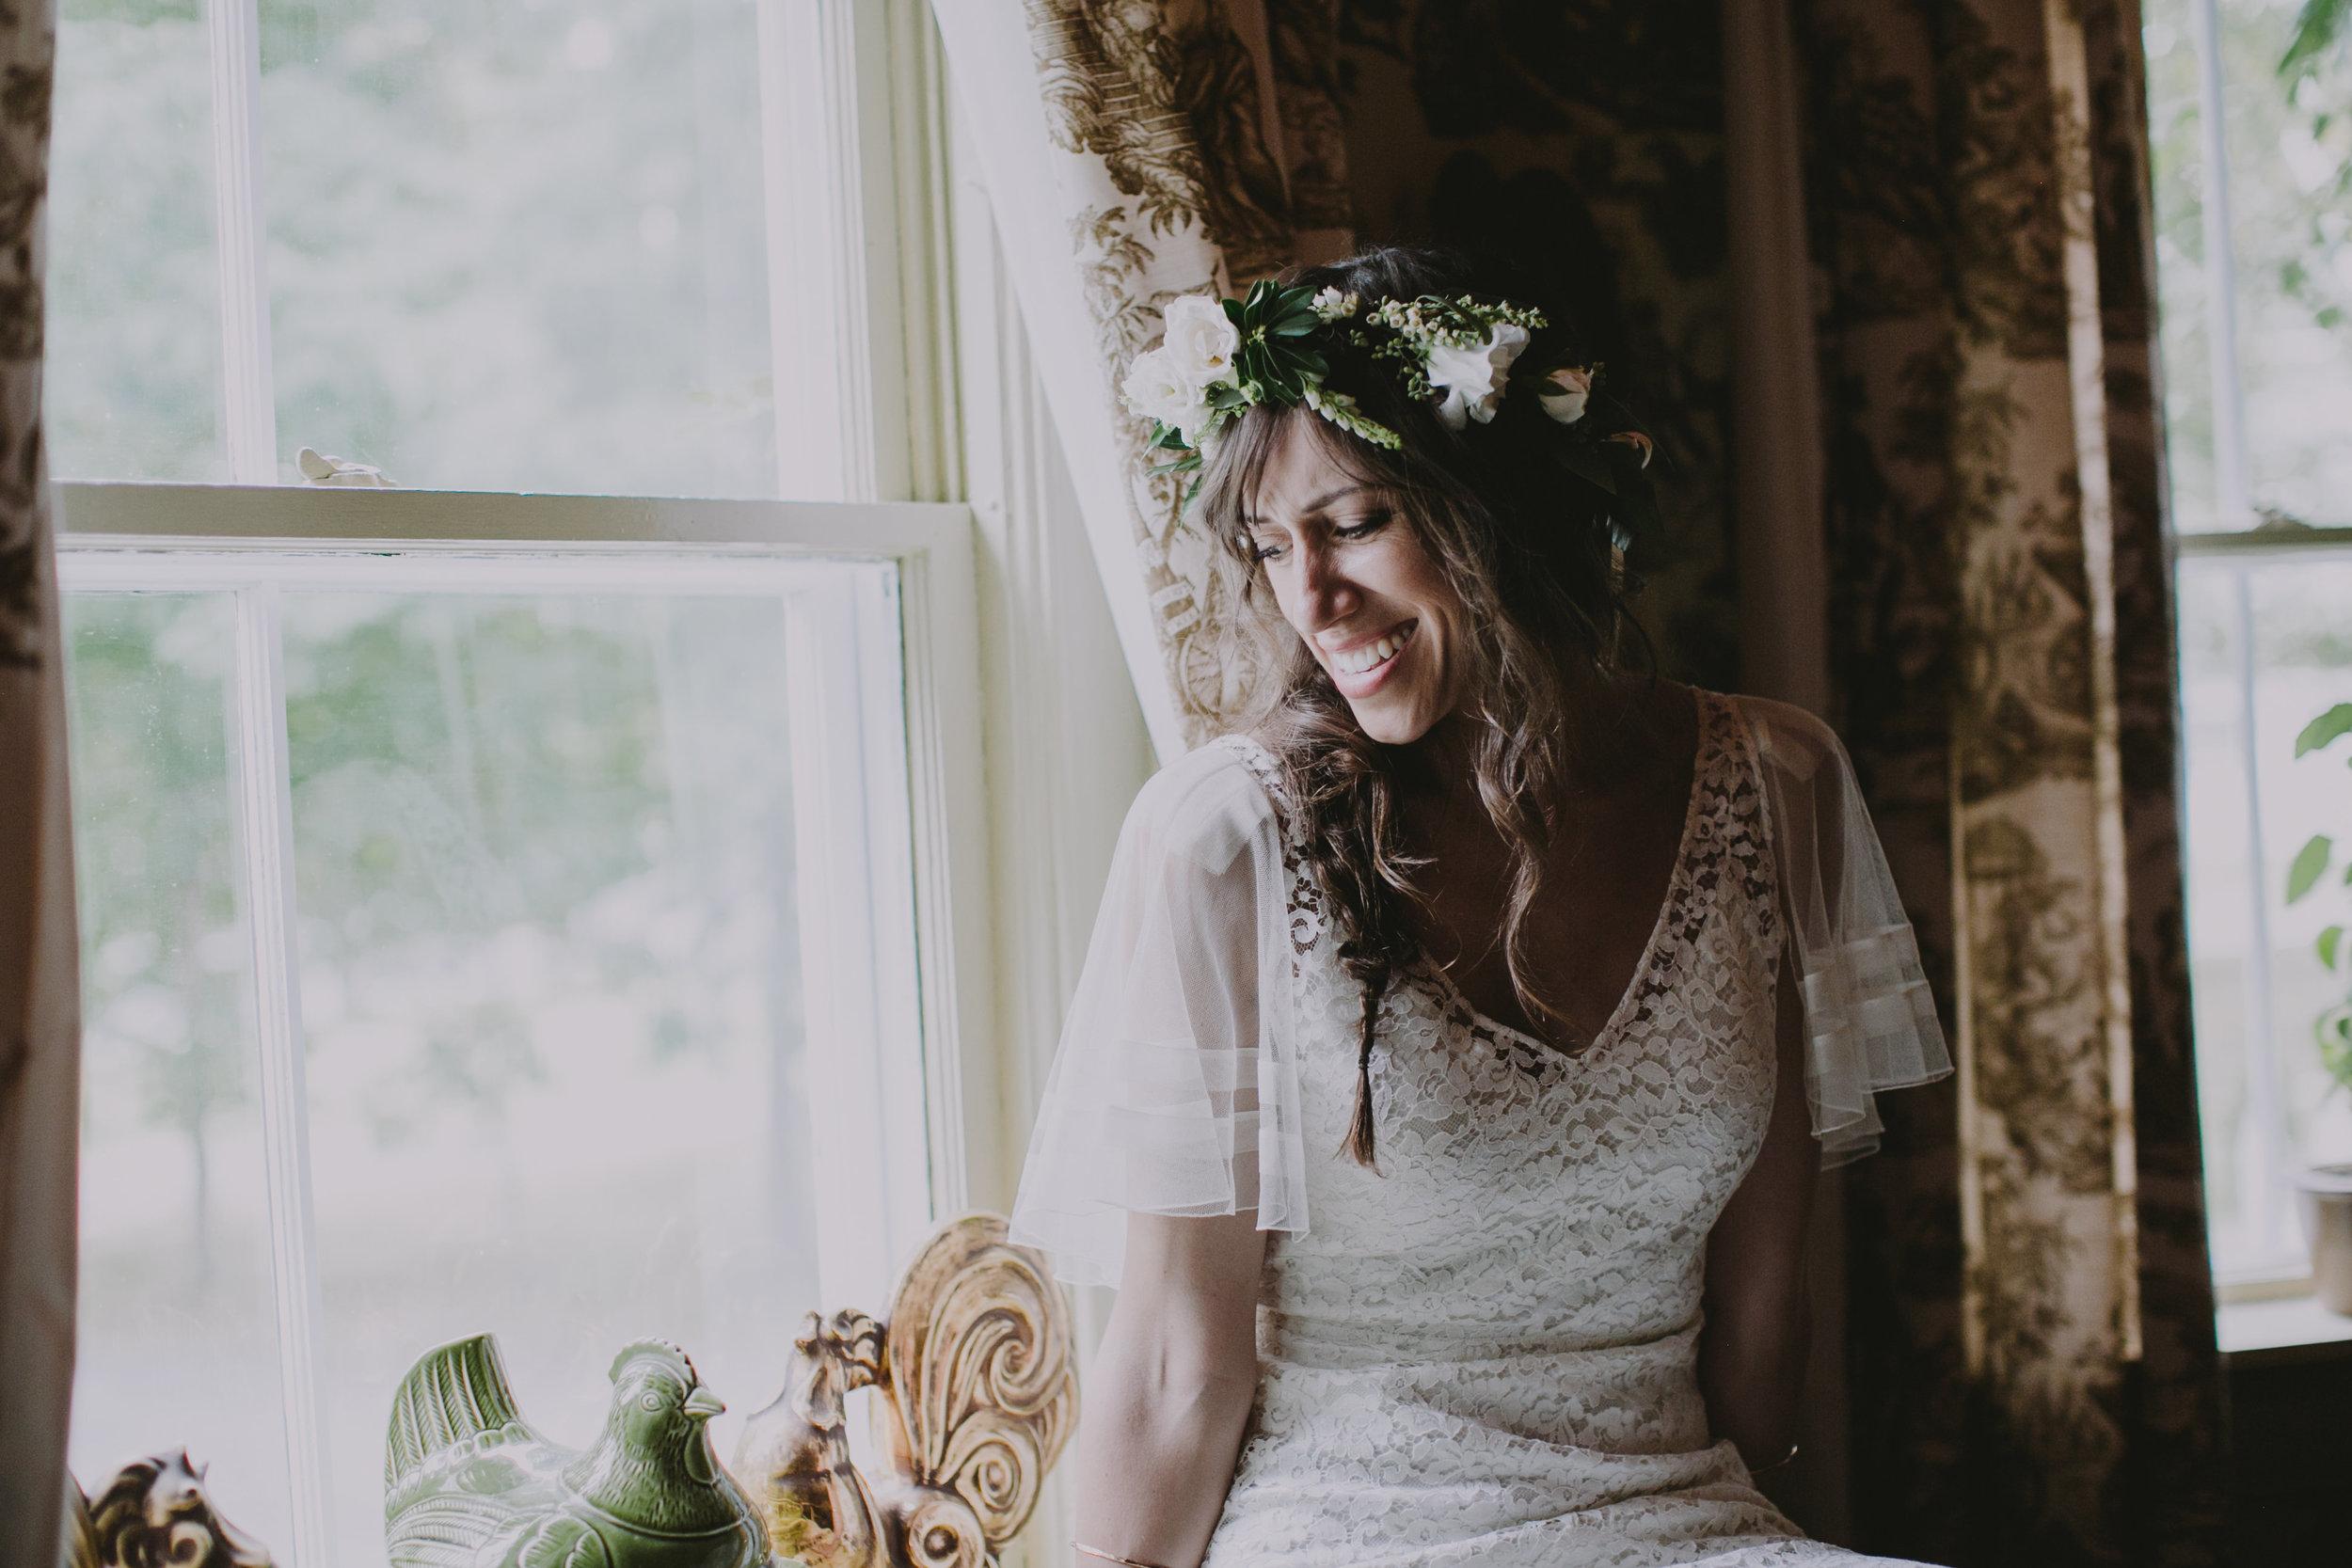 LIBERTY_VIEW_FARM_HIGHLAND_NY_WEDDING_CHELLISE_MICHAEL_PHOTOGRAPHY821.JPG